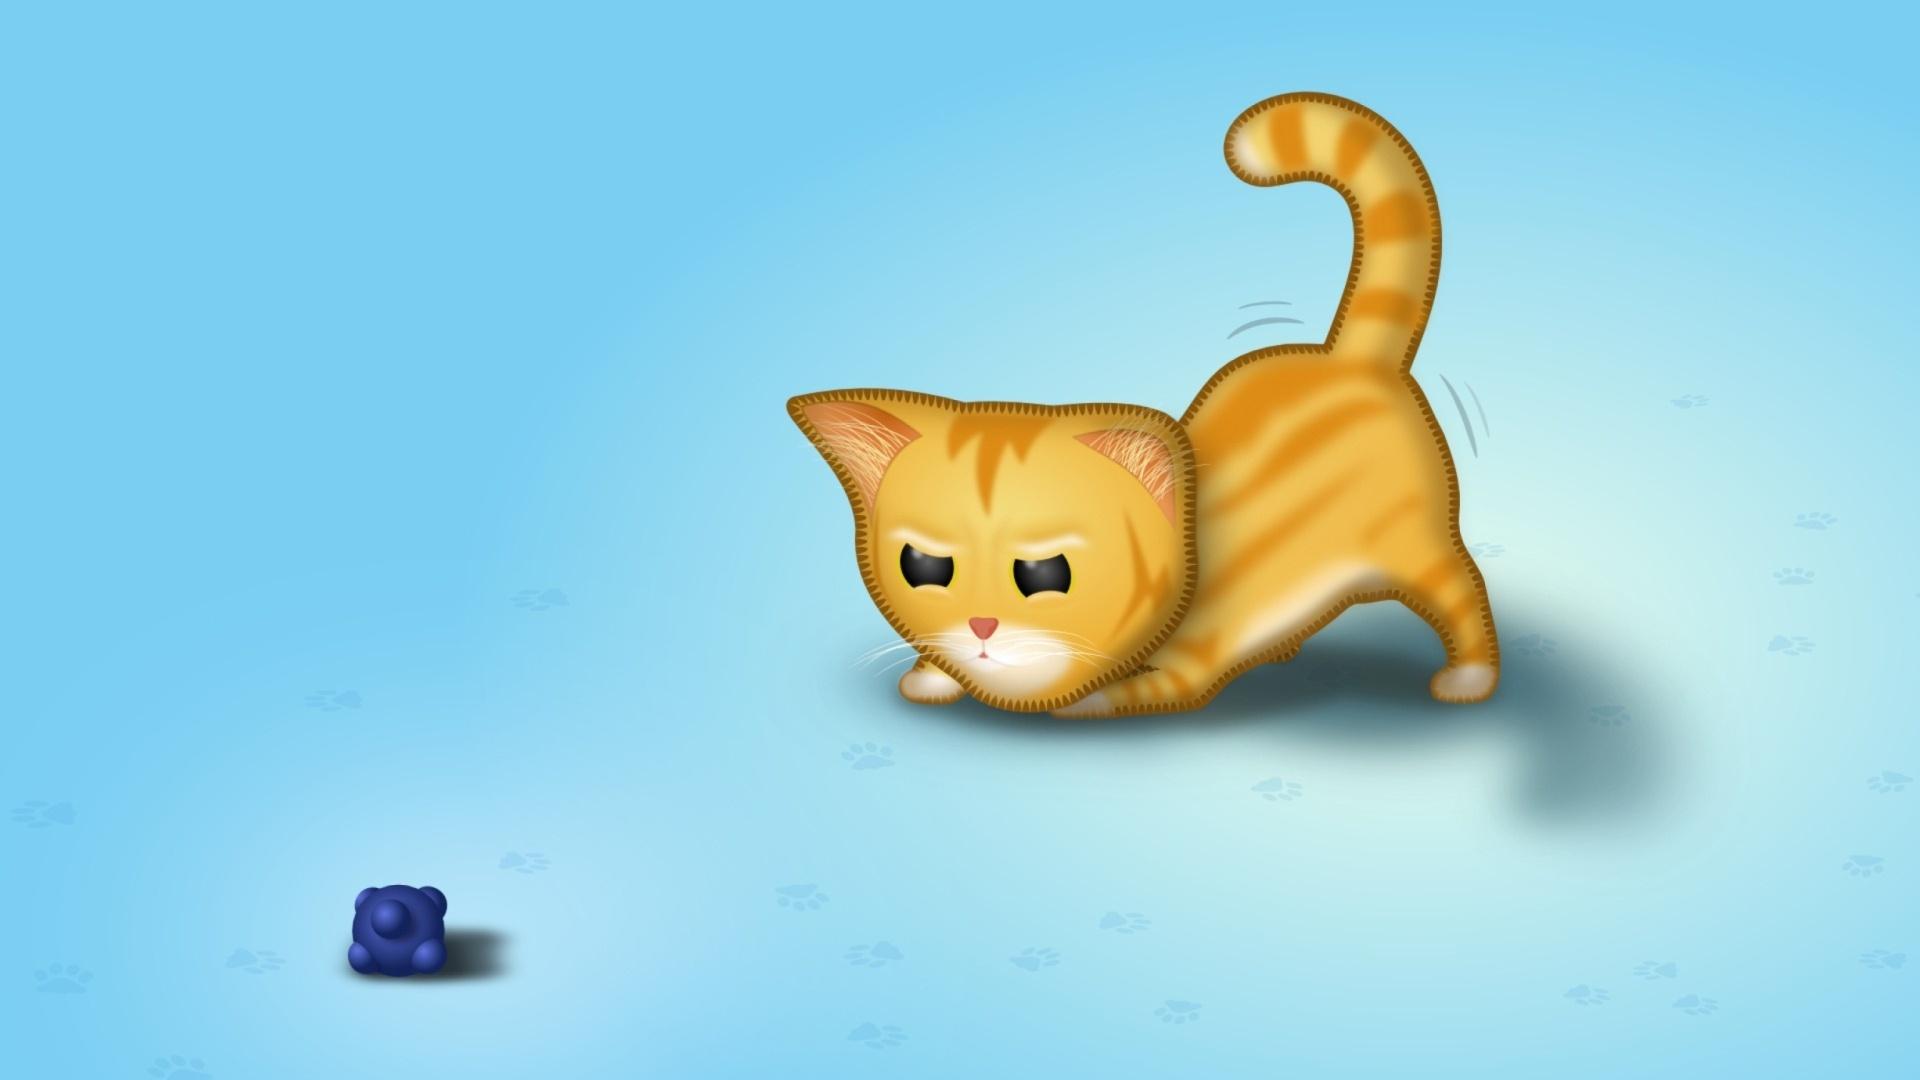 Drawn Cats wallpaper photo hd